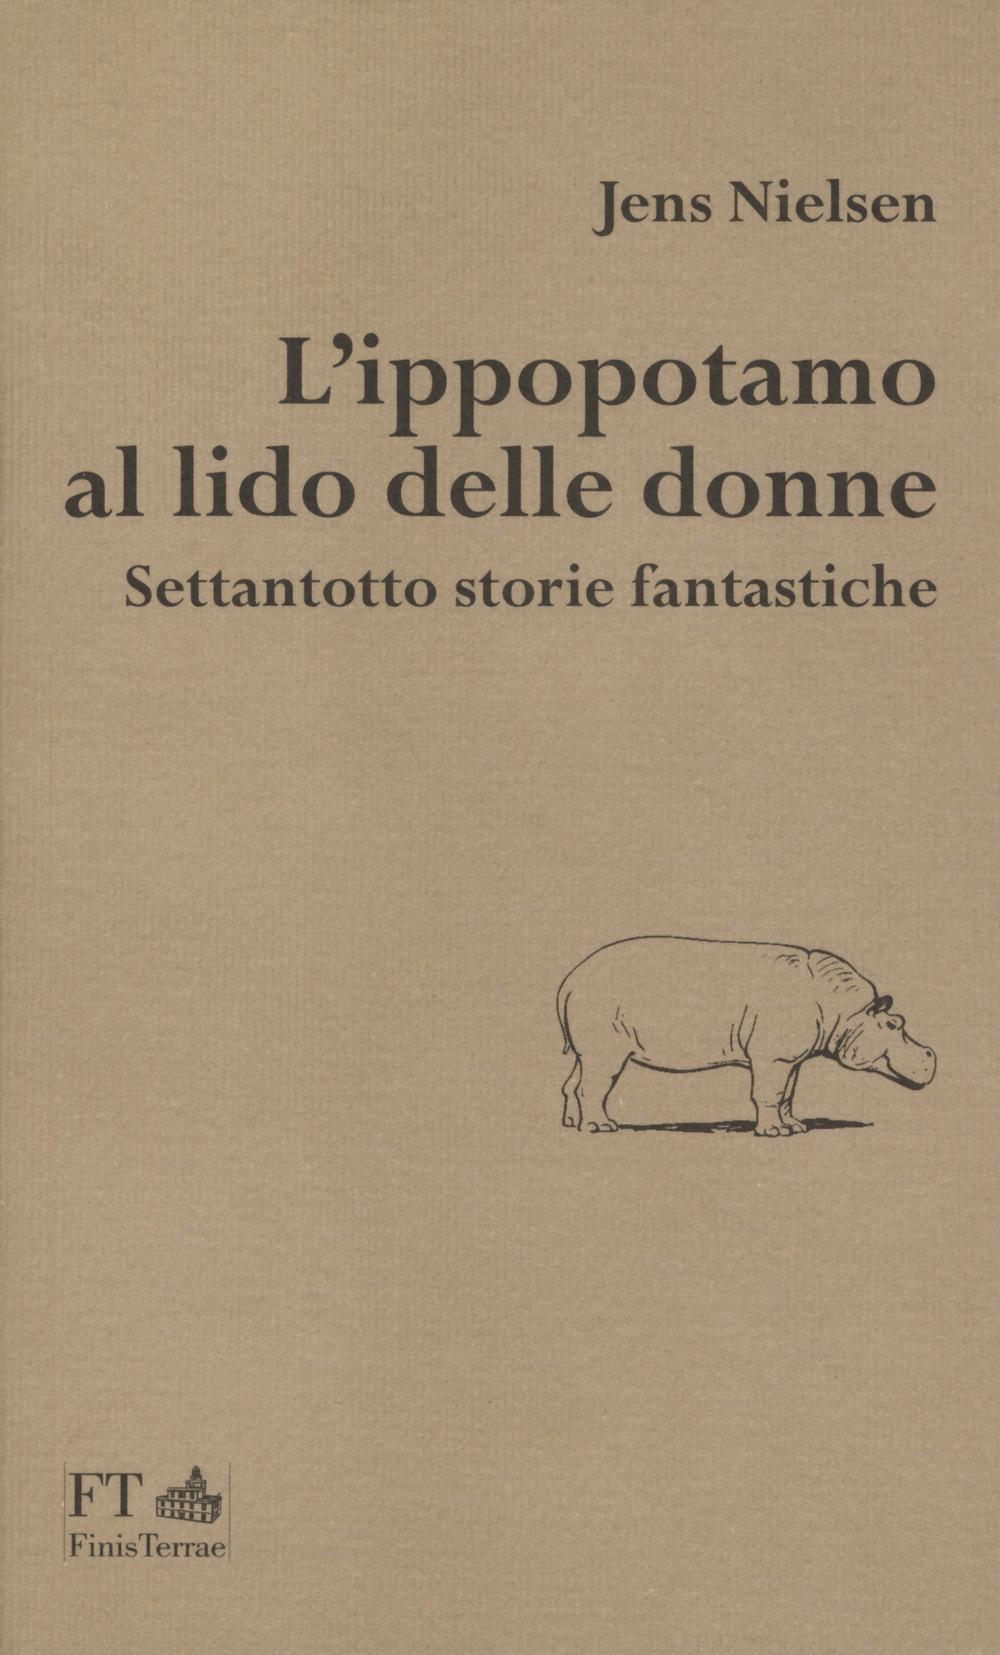 L'ippopotamo al lido delle donne. Settantotto storie fantastiche